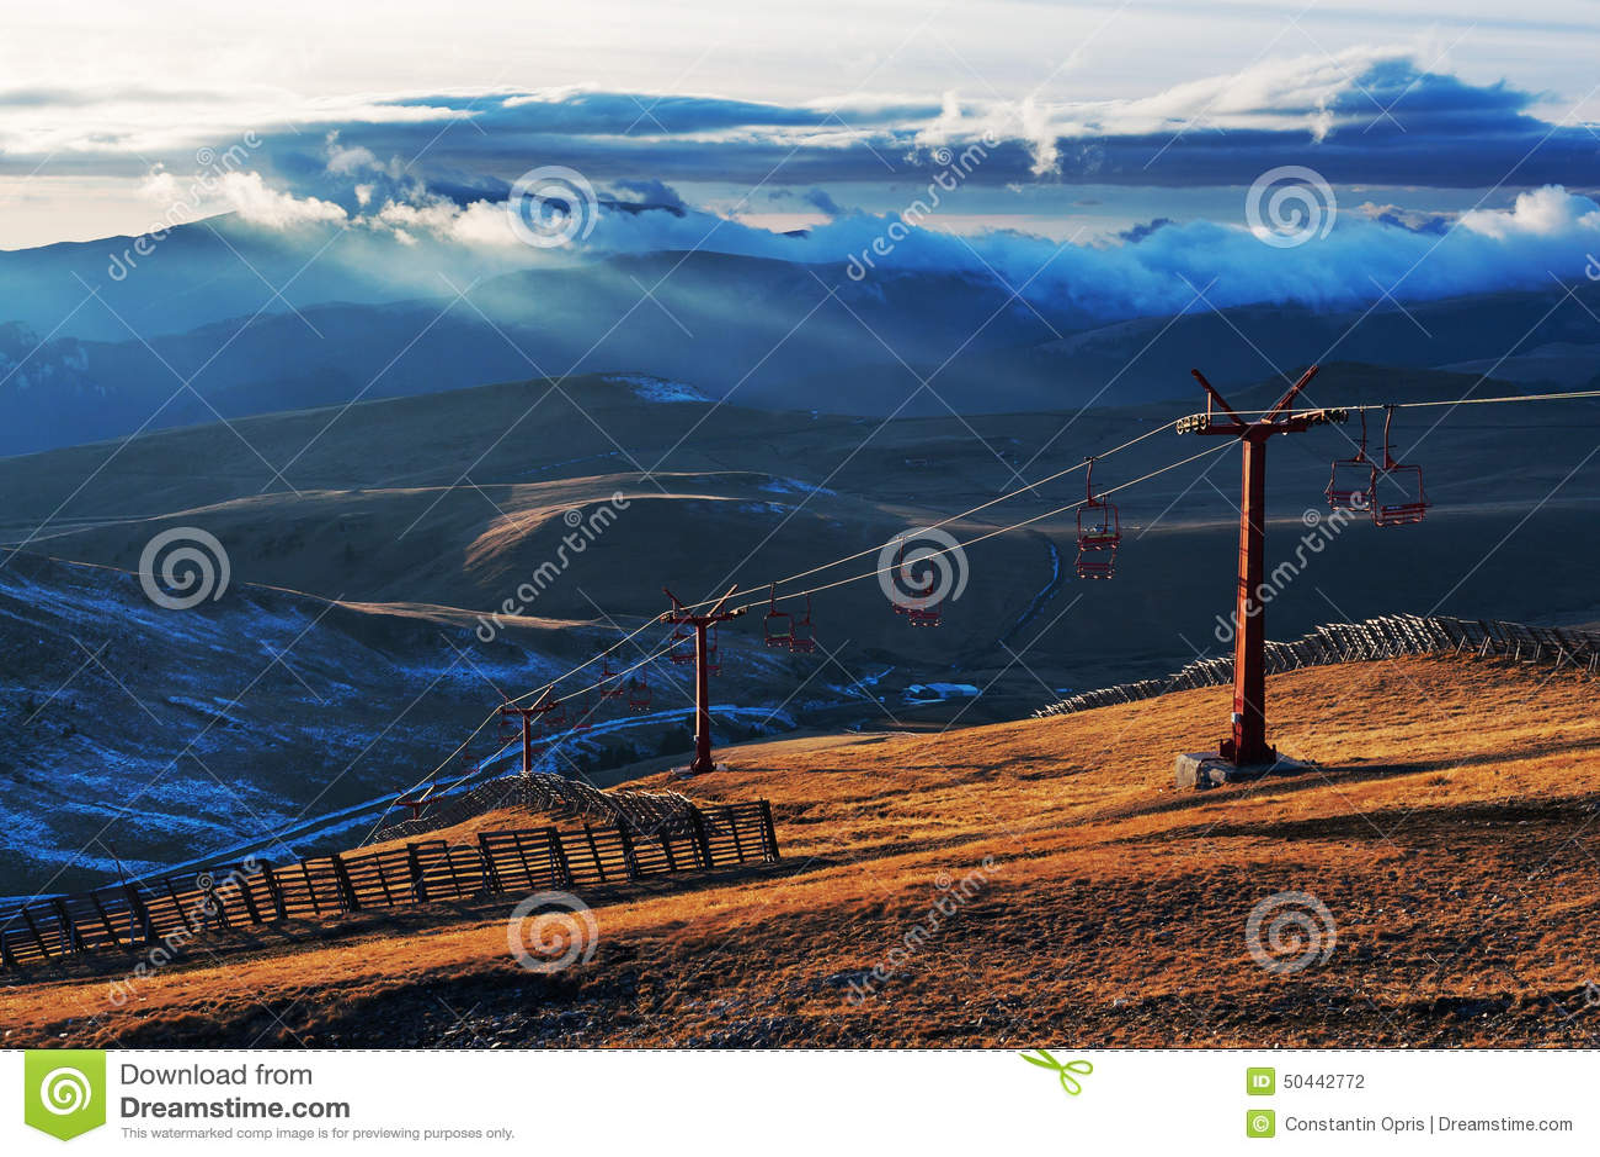 Best All Mountain Ski.html